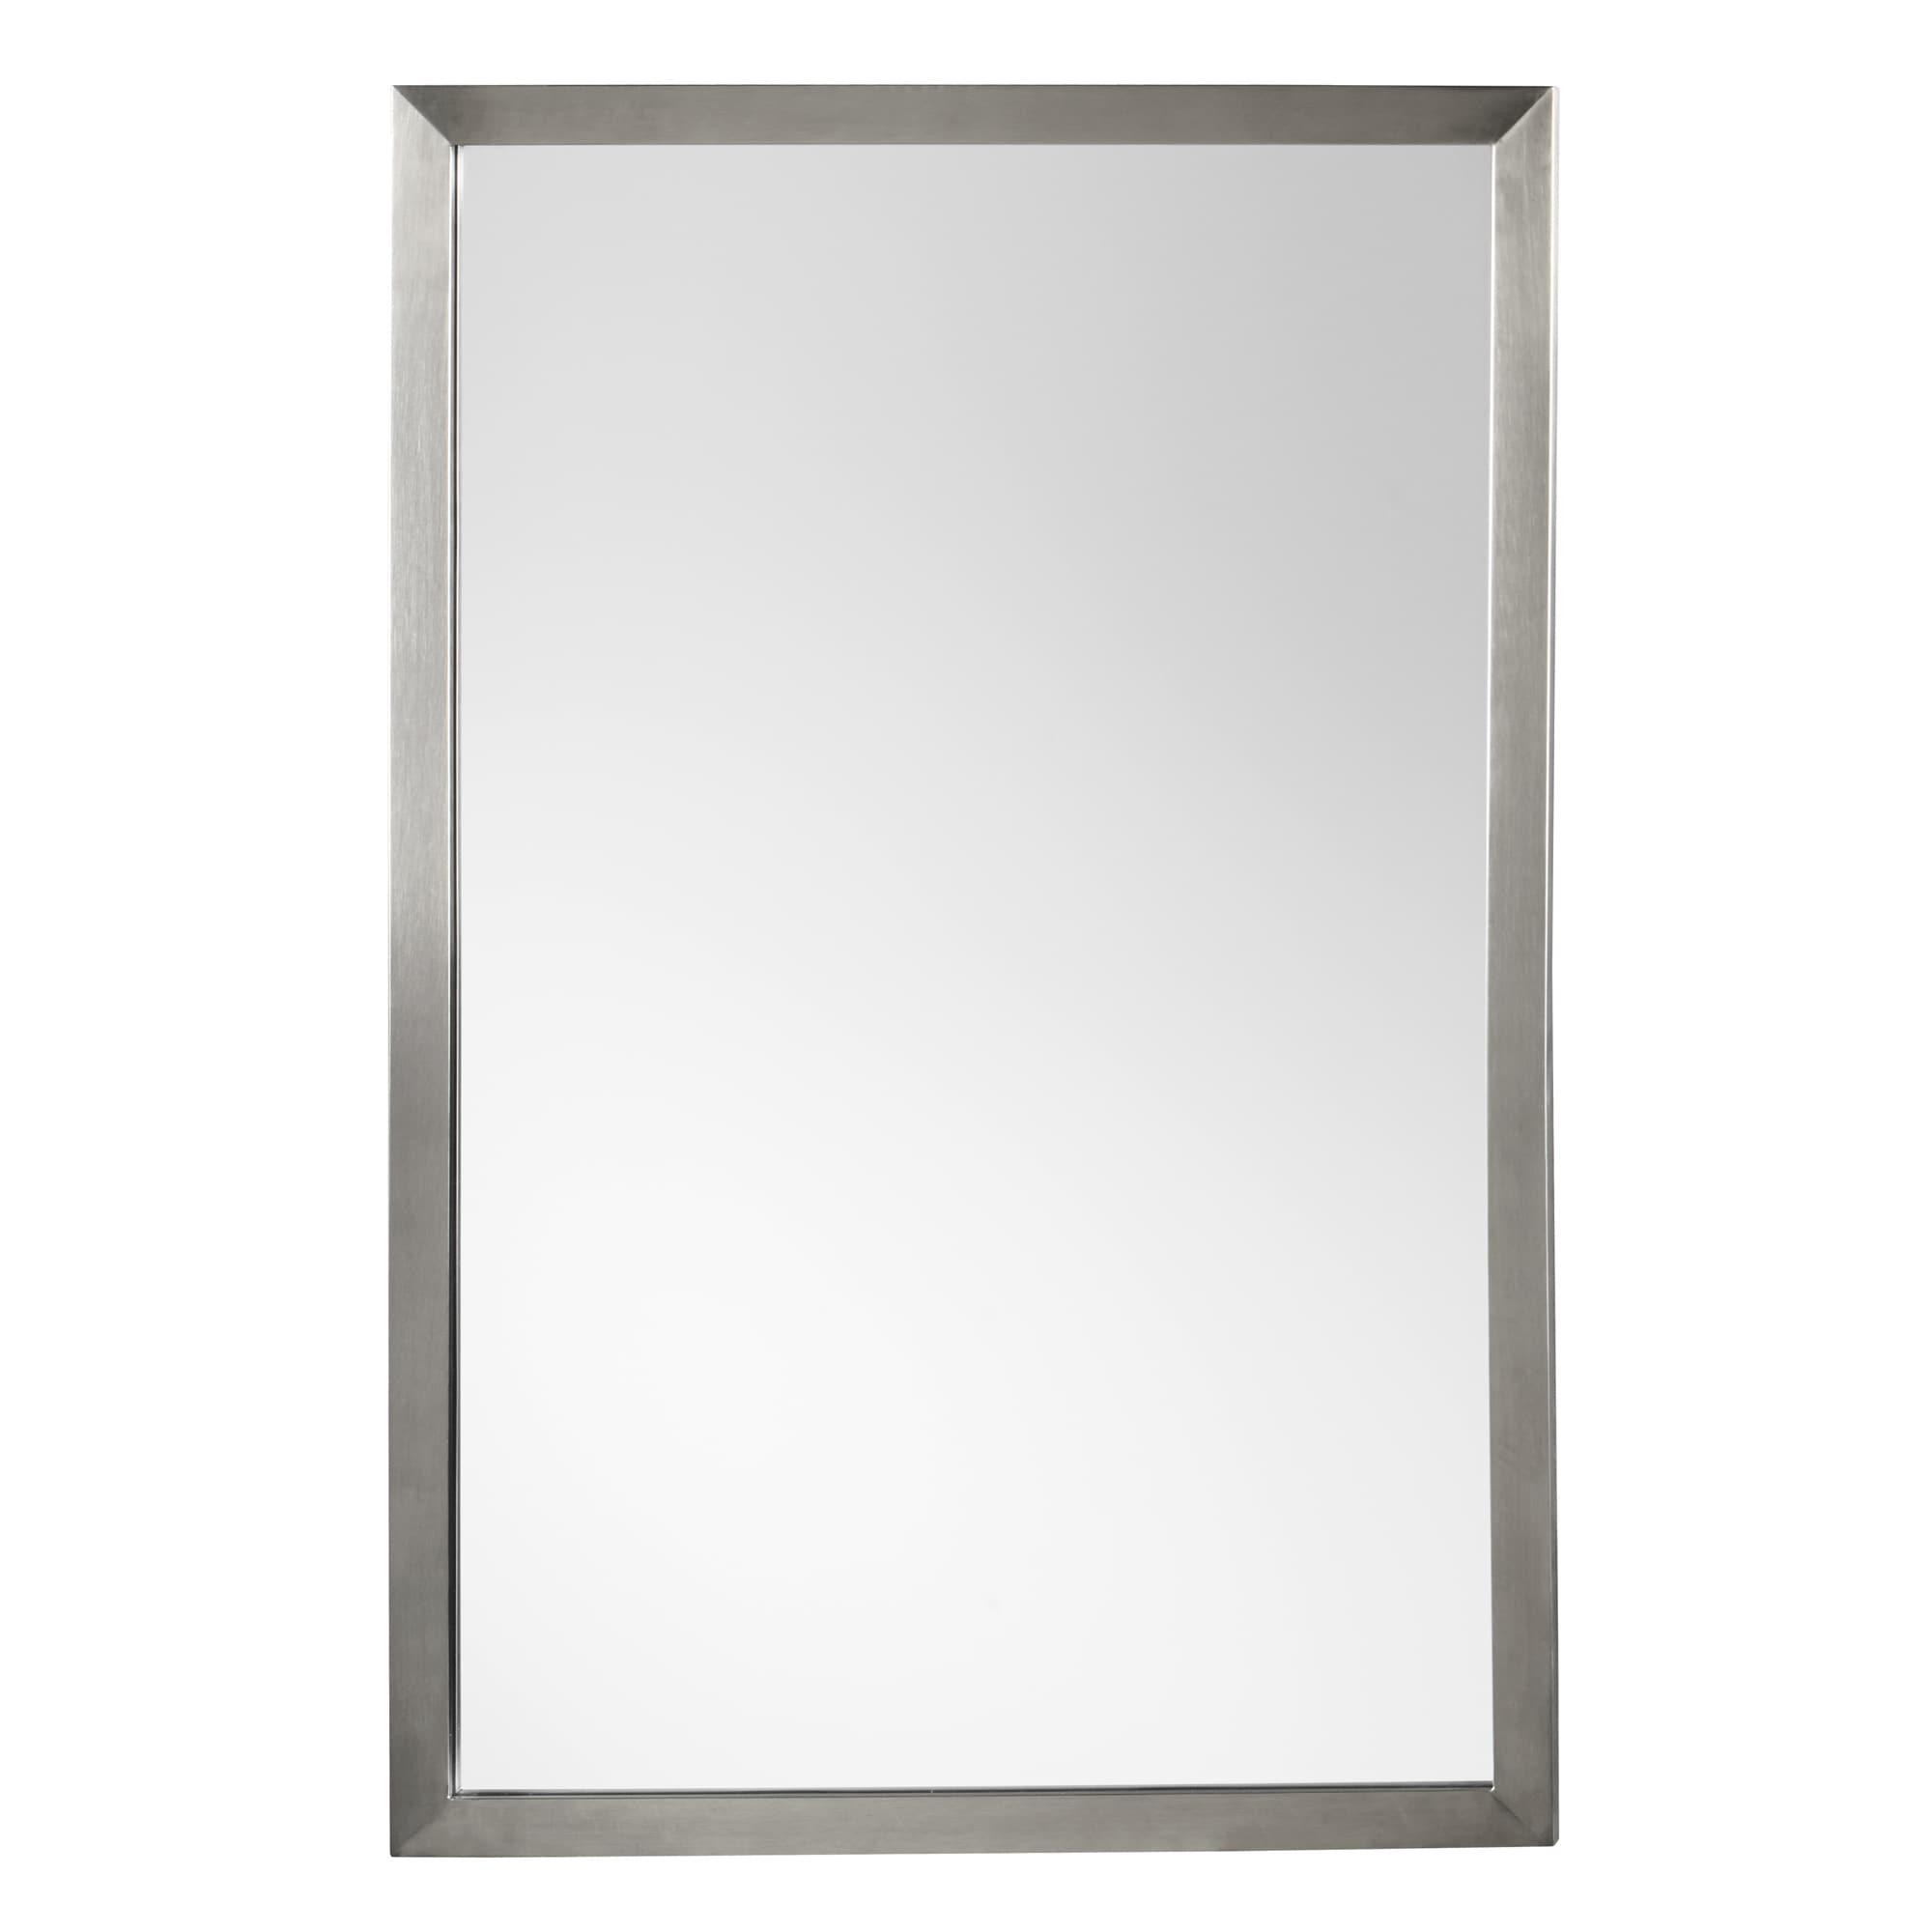 Shop Ronbow Emile Metal Frame Bathroom Vanity Mirror Overstock 14456586 Silver Chrome